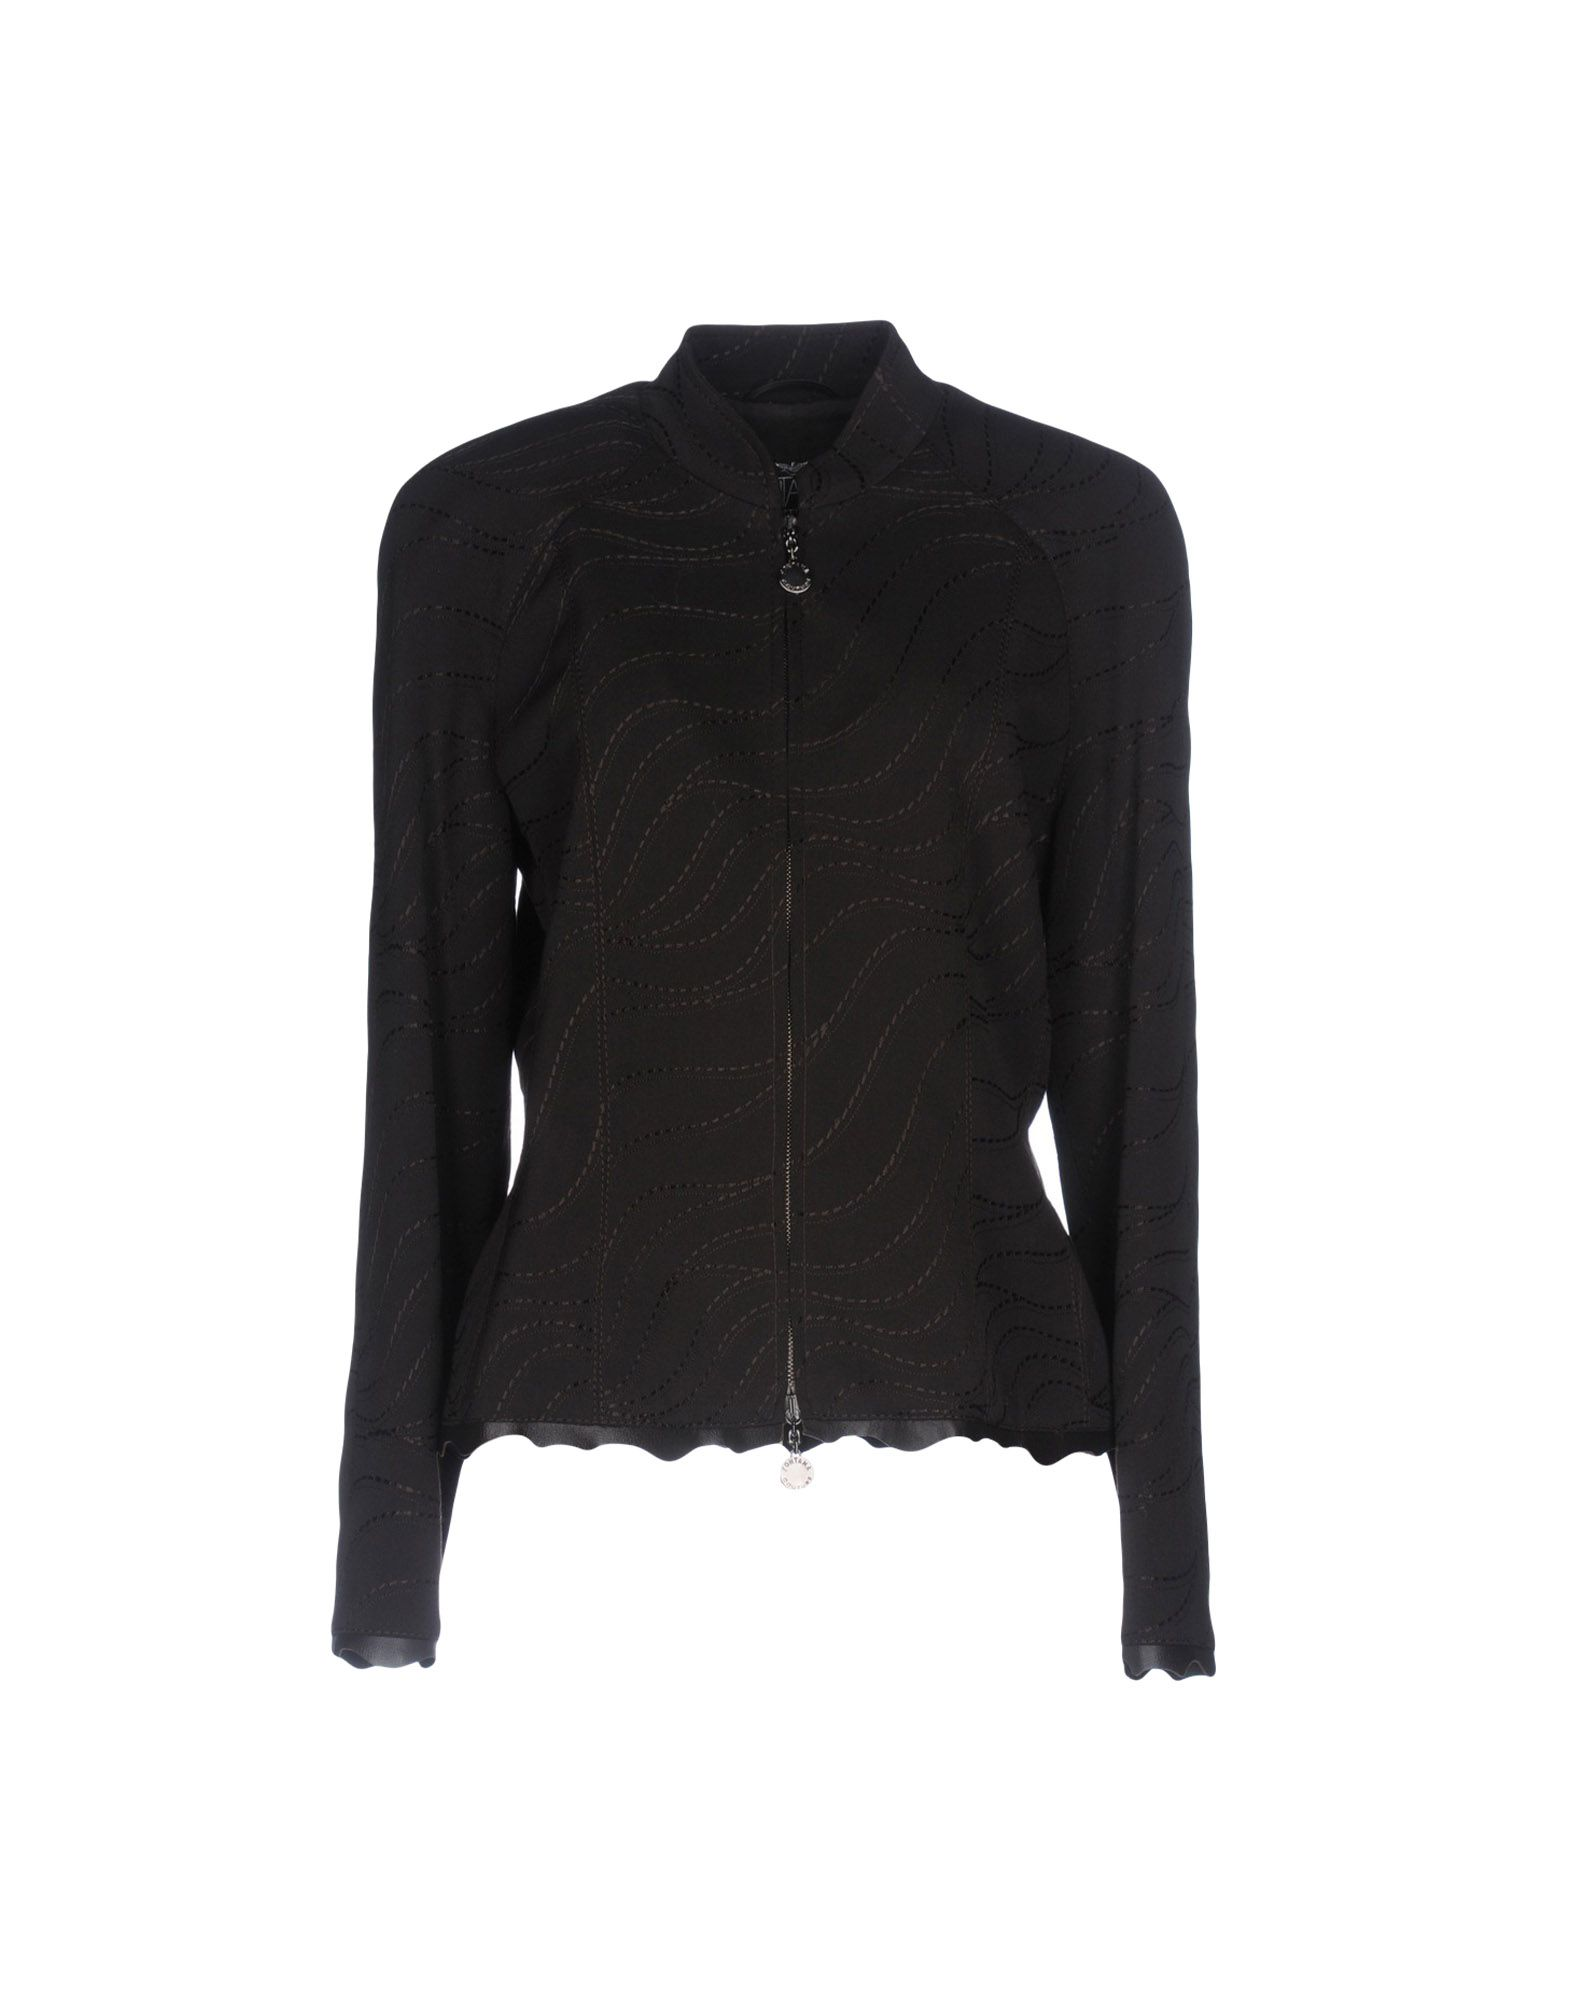 FONTANA COUTURE Куртка nina ricci часы nina ricci n033 42 11 81 коллекция n033